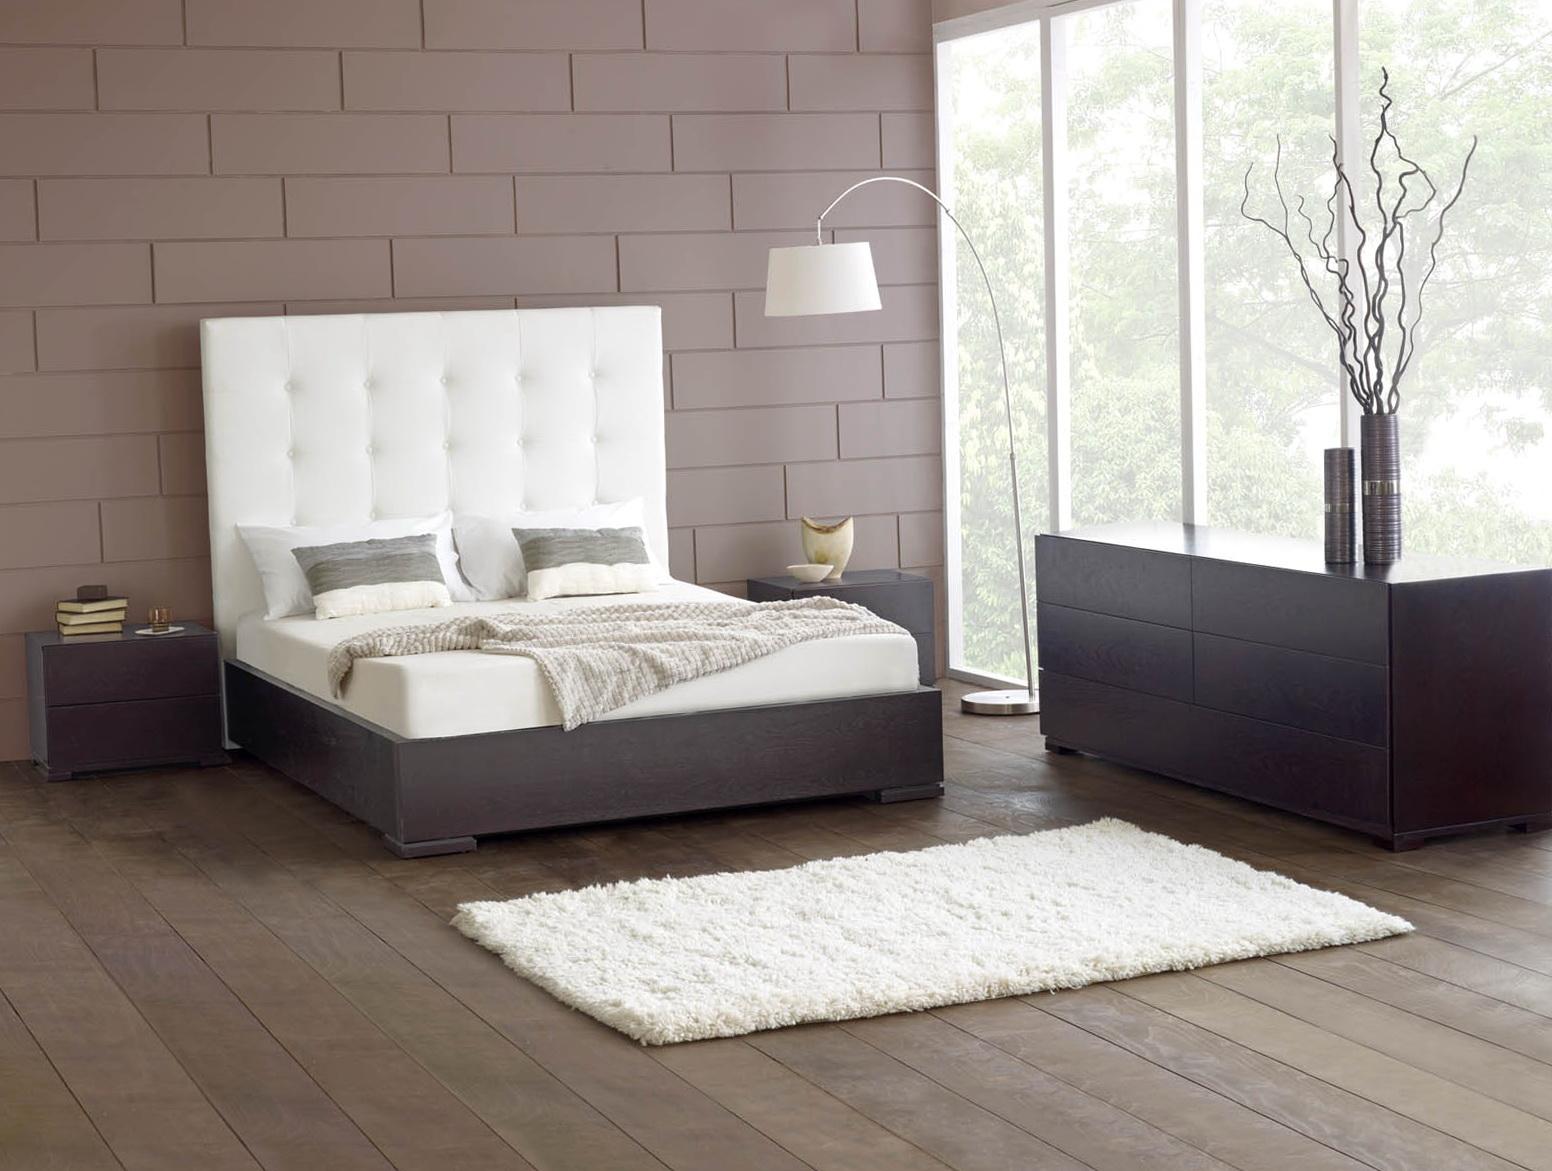 Ikea Storage Cabinets Bedroom